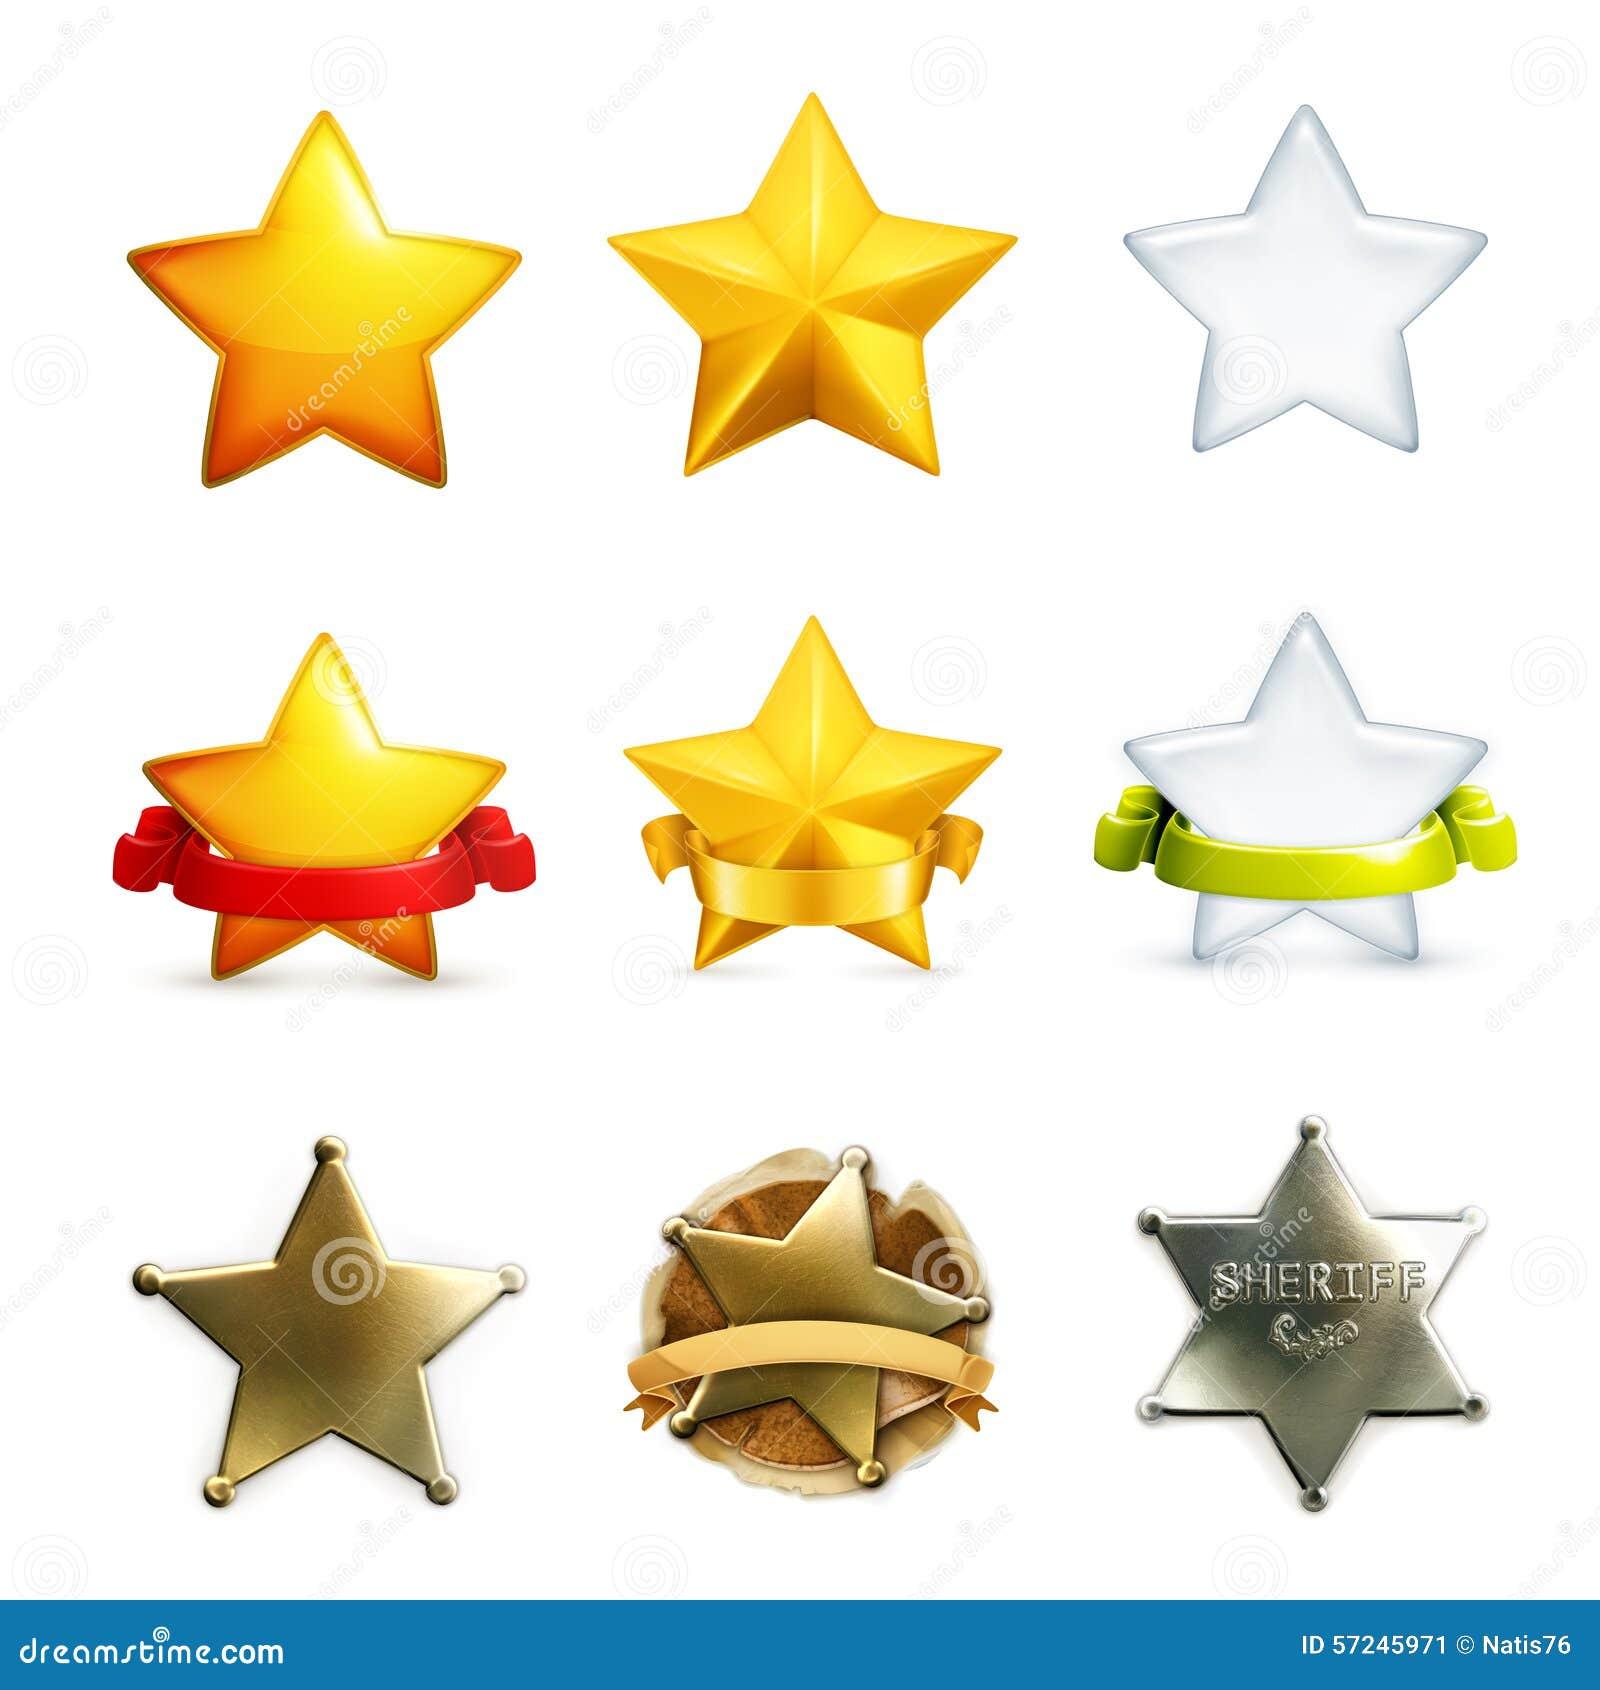 Stars vector icons